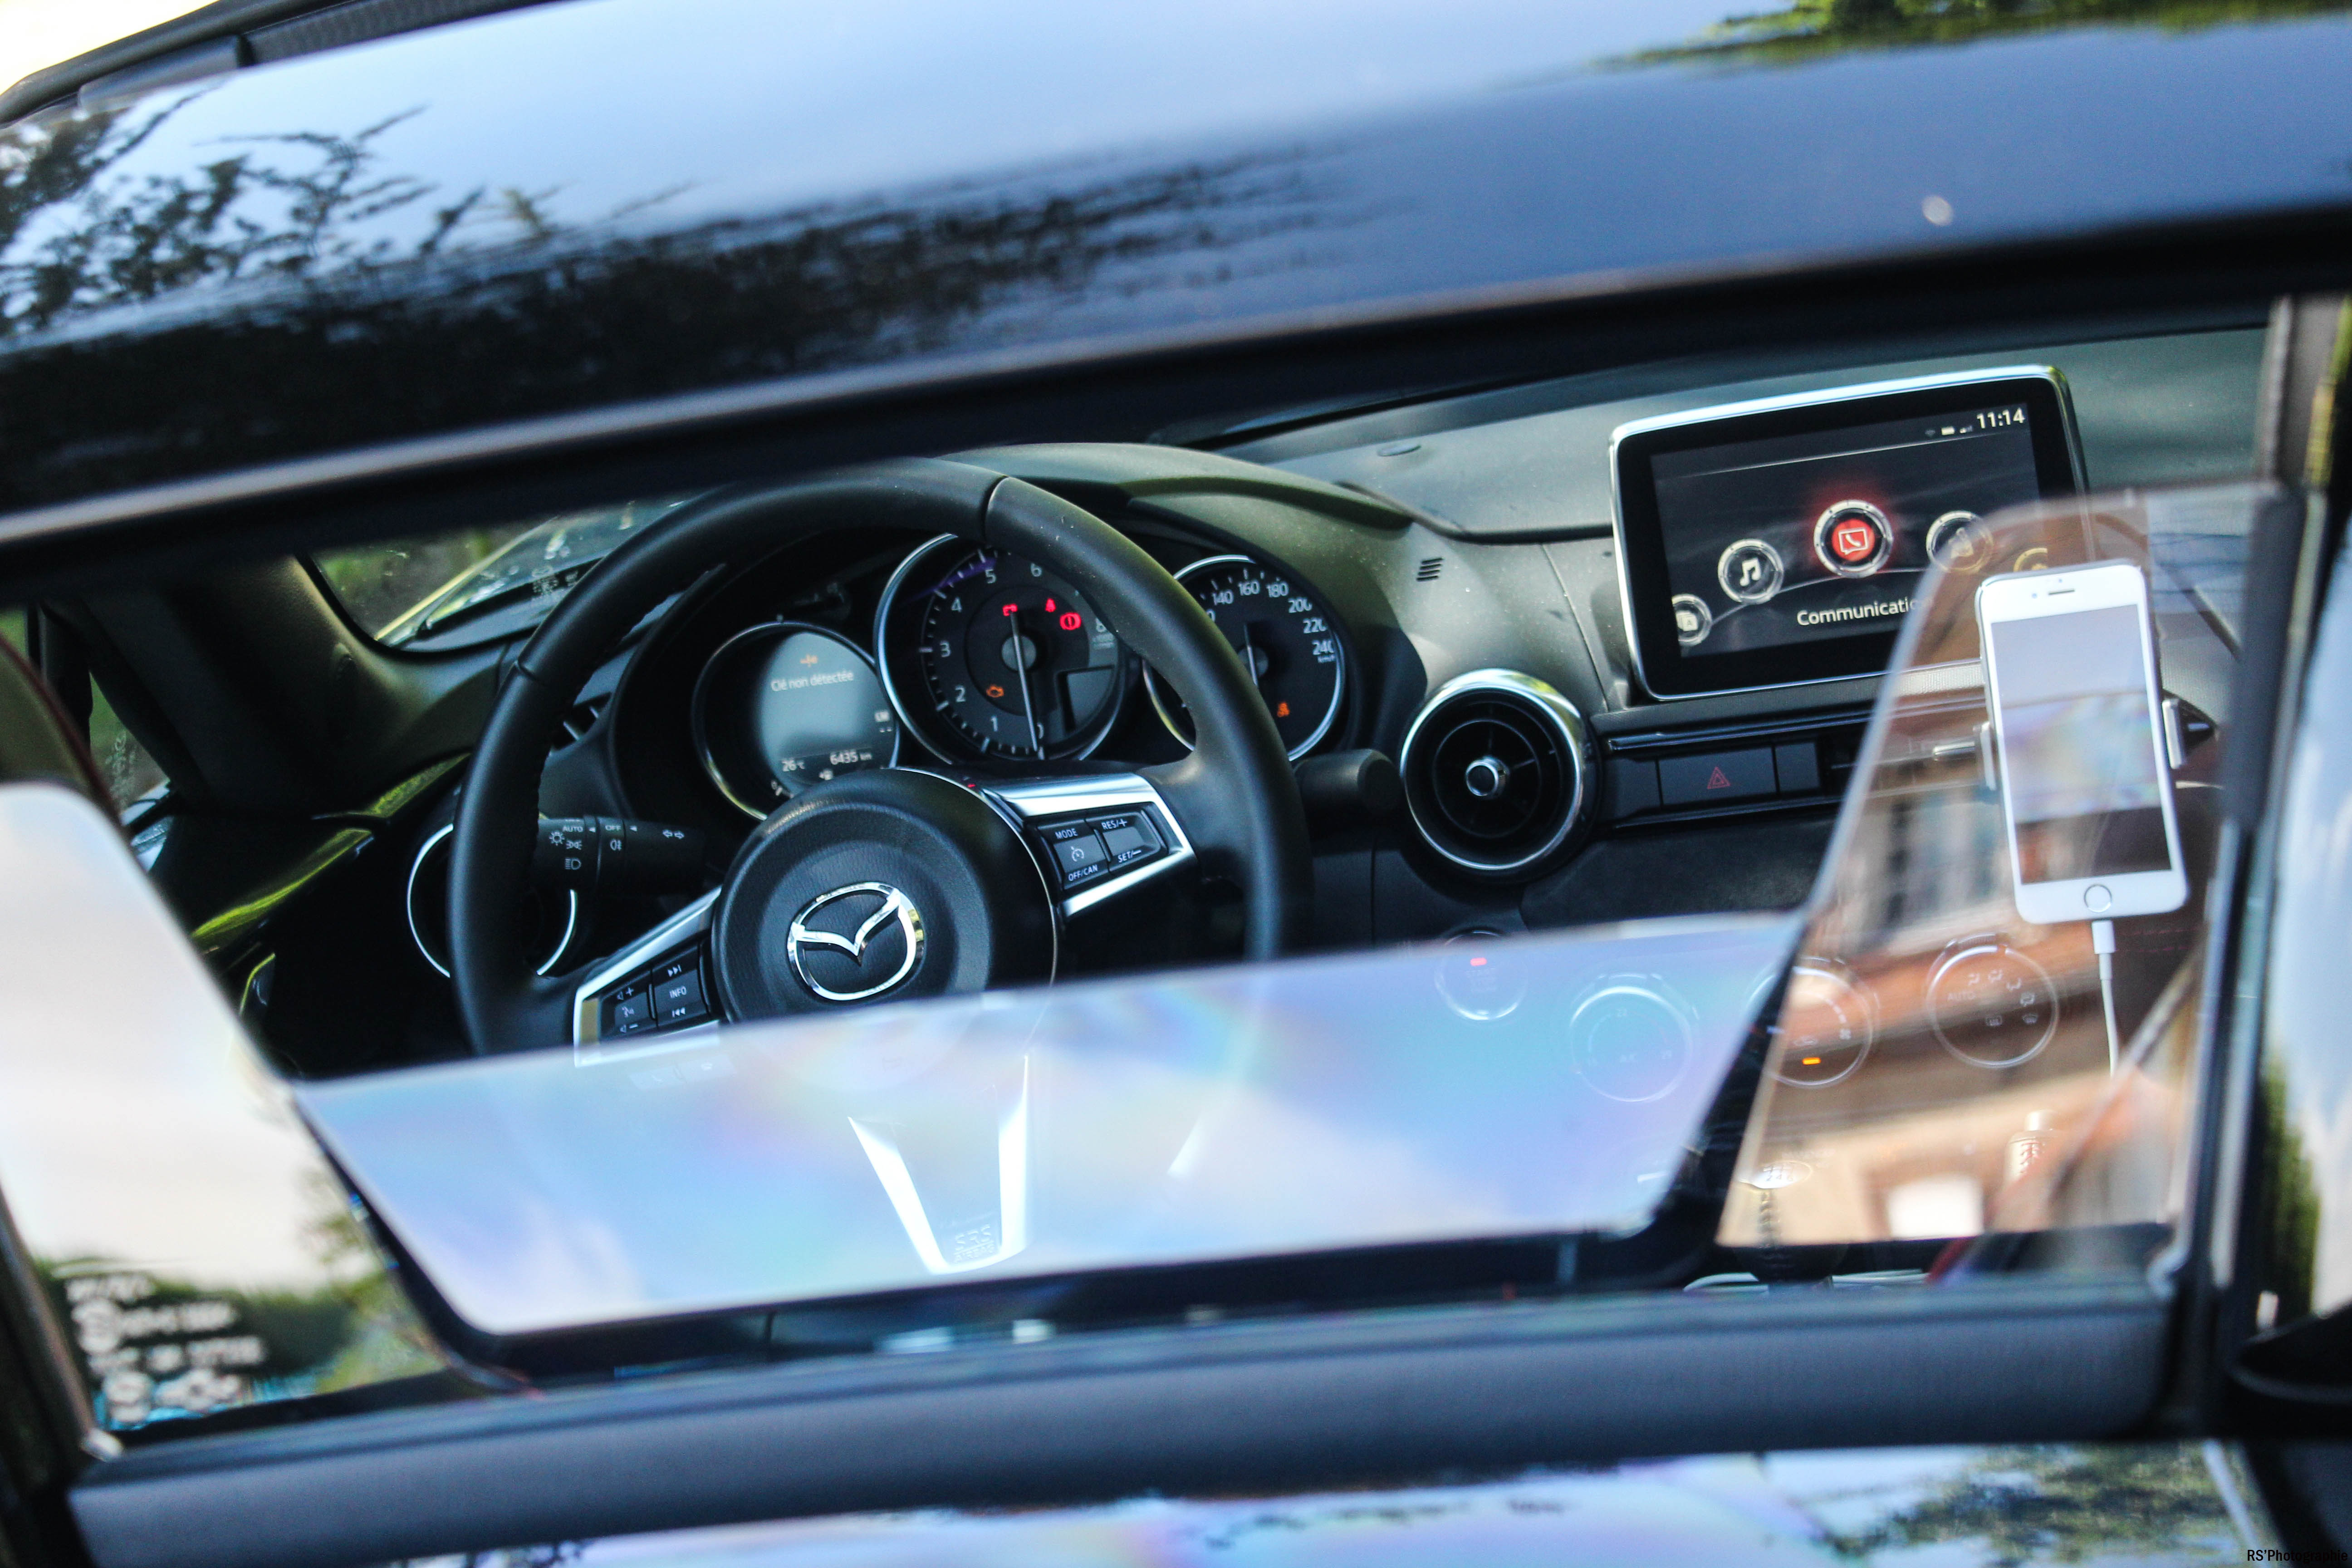 MazdaMX5RF42-mazda-mx5-rf-edition-intérieur-onboard-arnaud-demasier-RSPhotographie